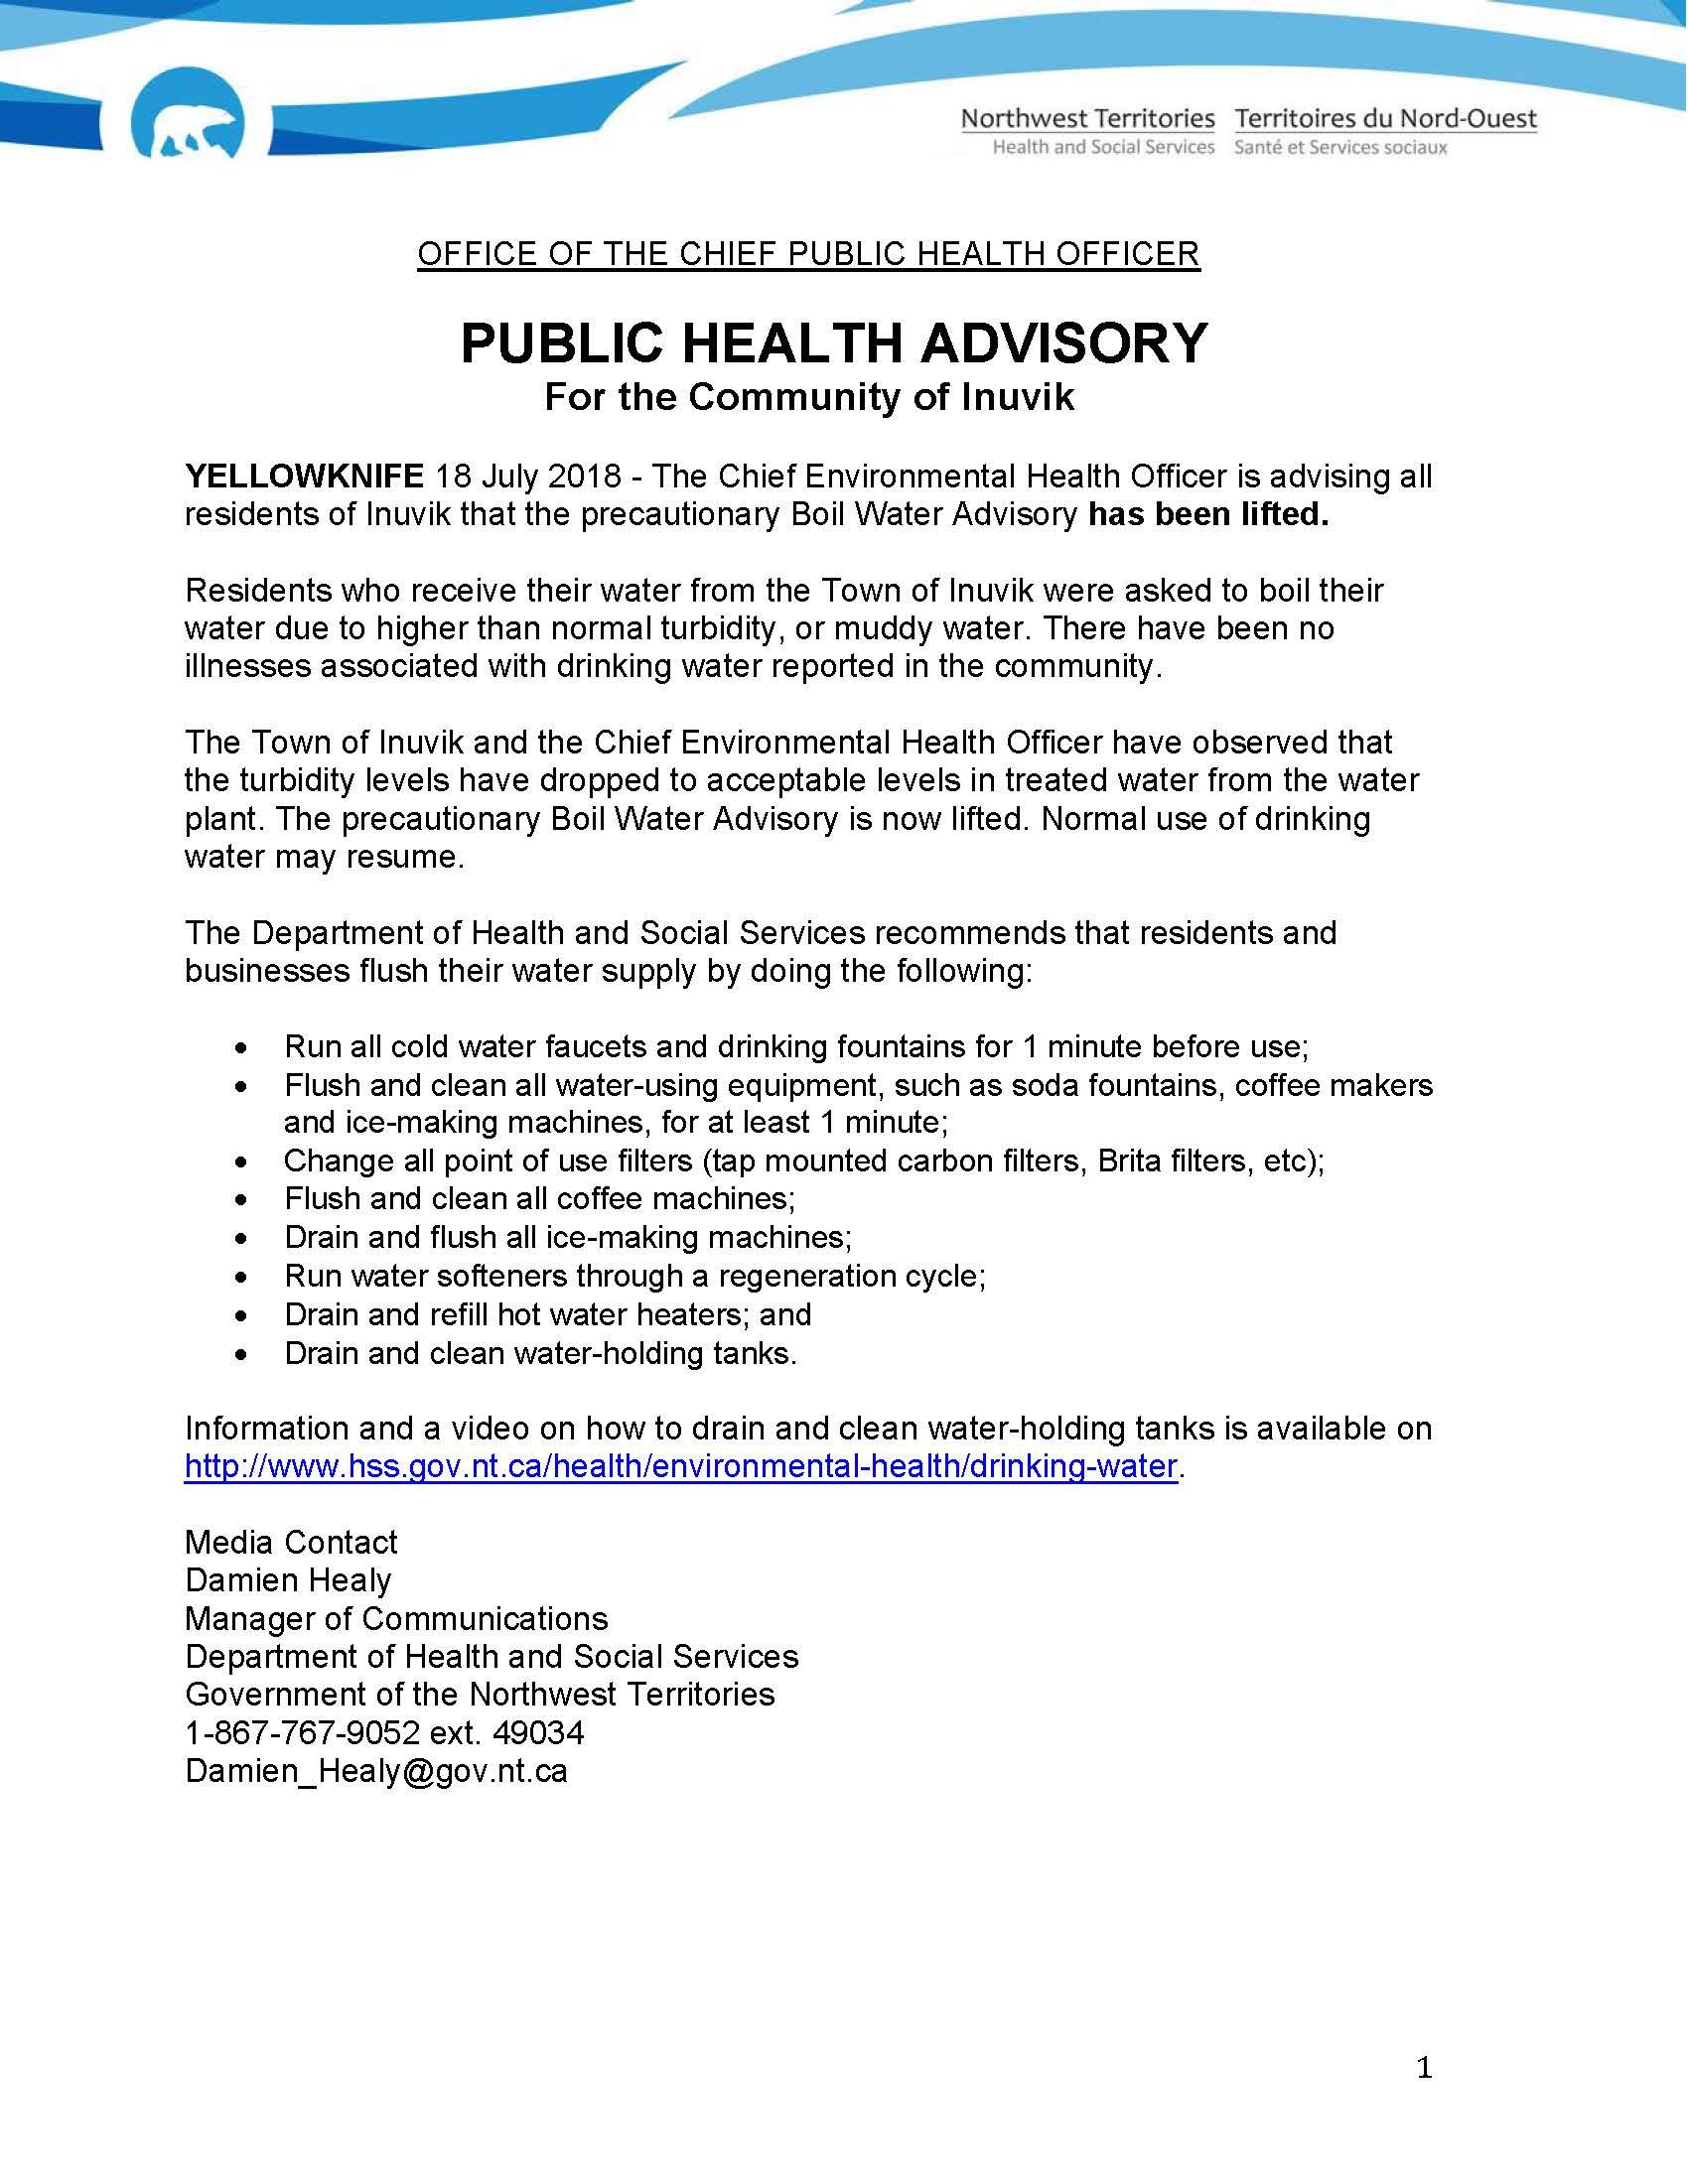 Precautionary Boil Water Advisory has been lifted